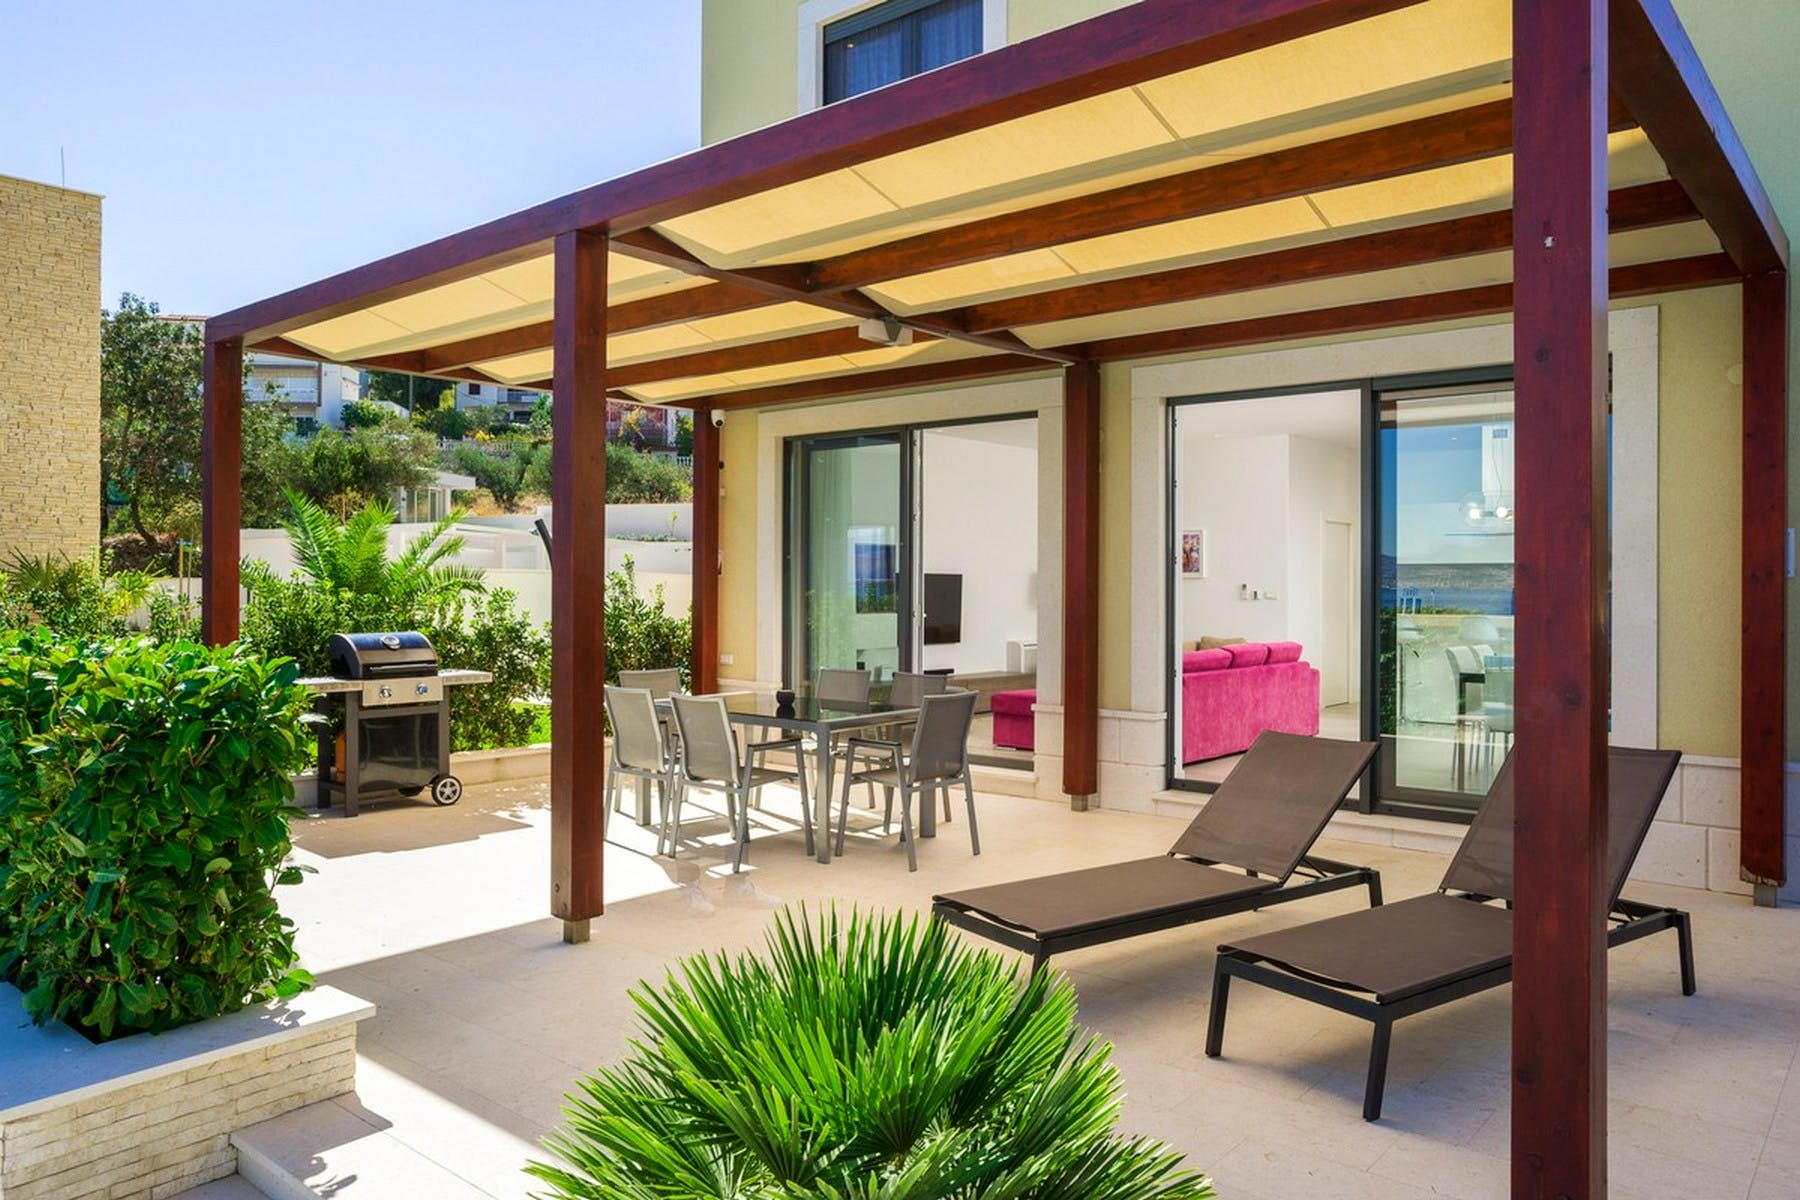 Outdoor sunbathing area